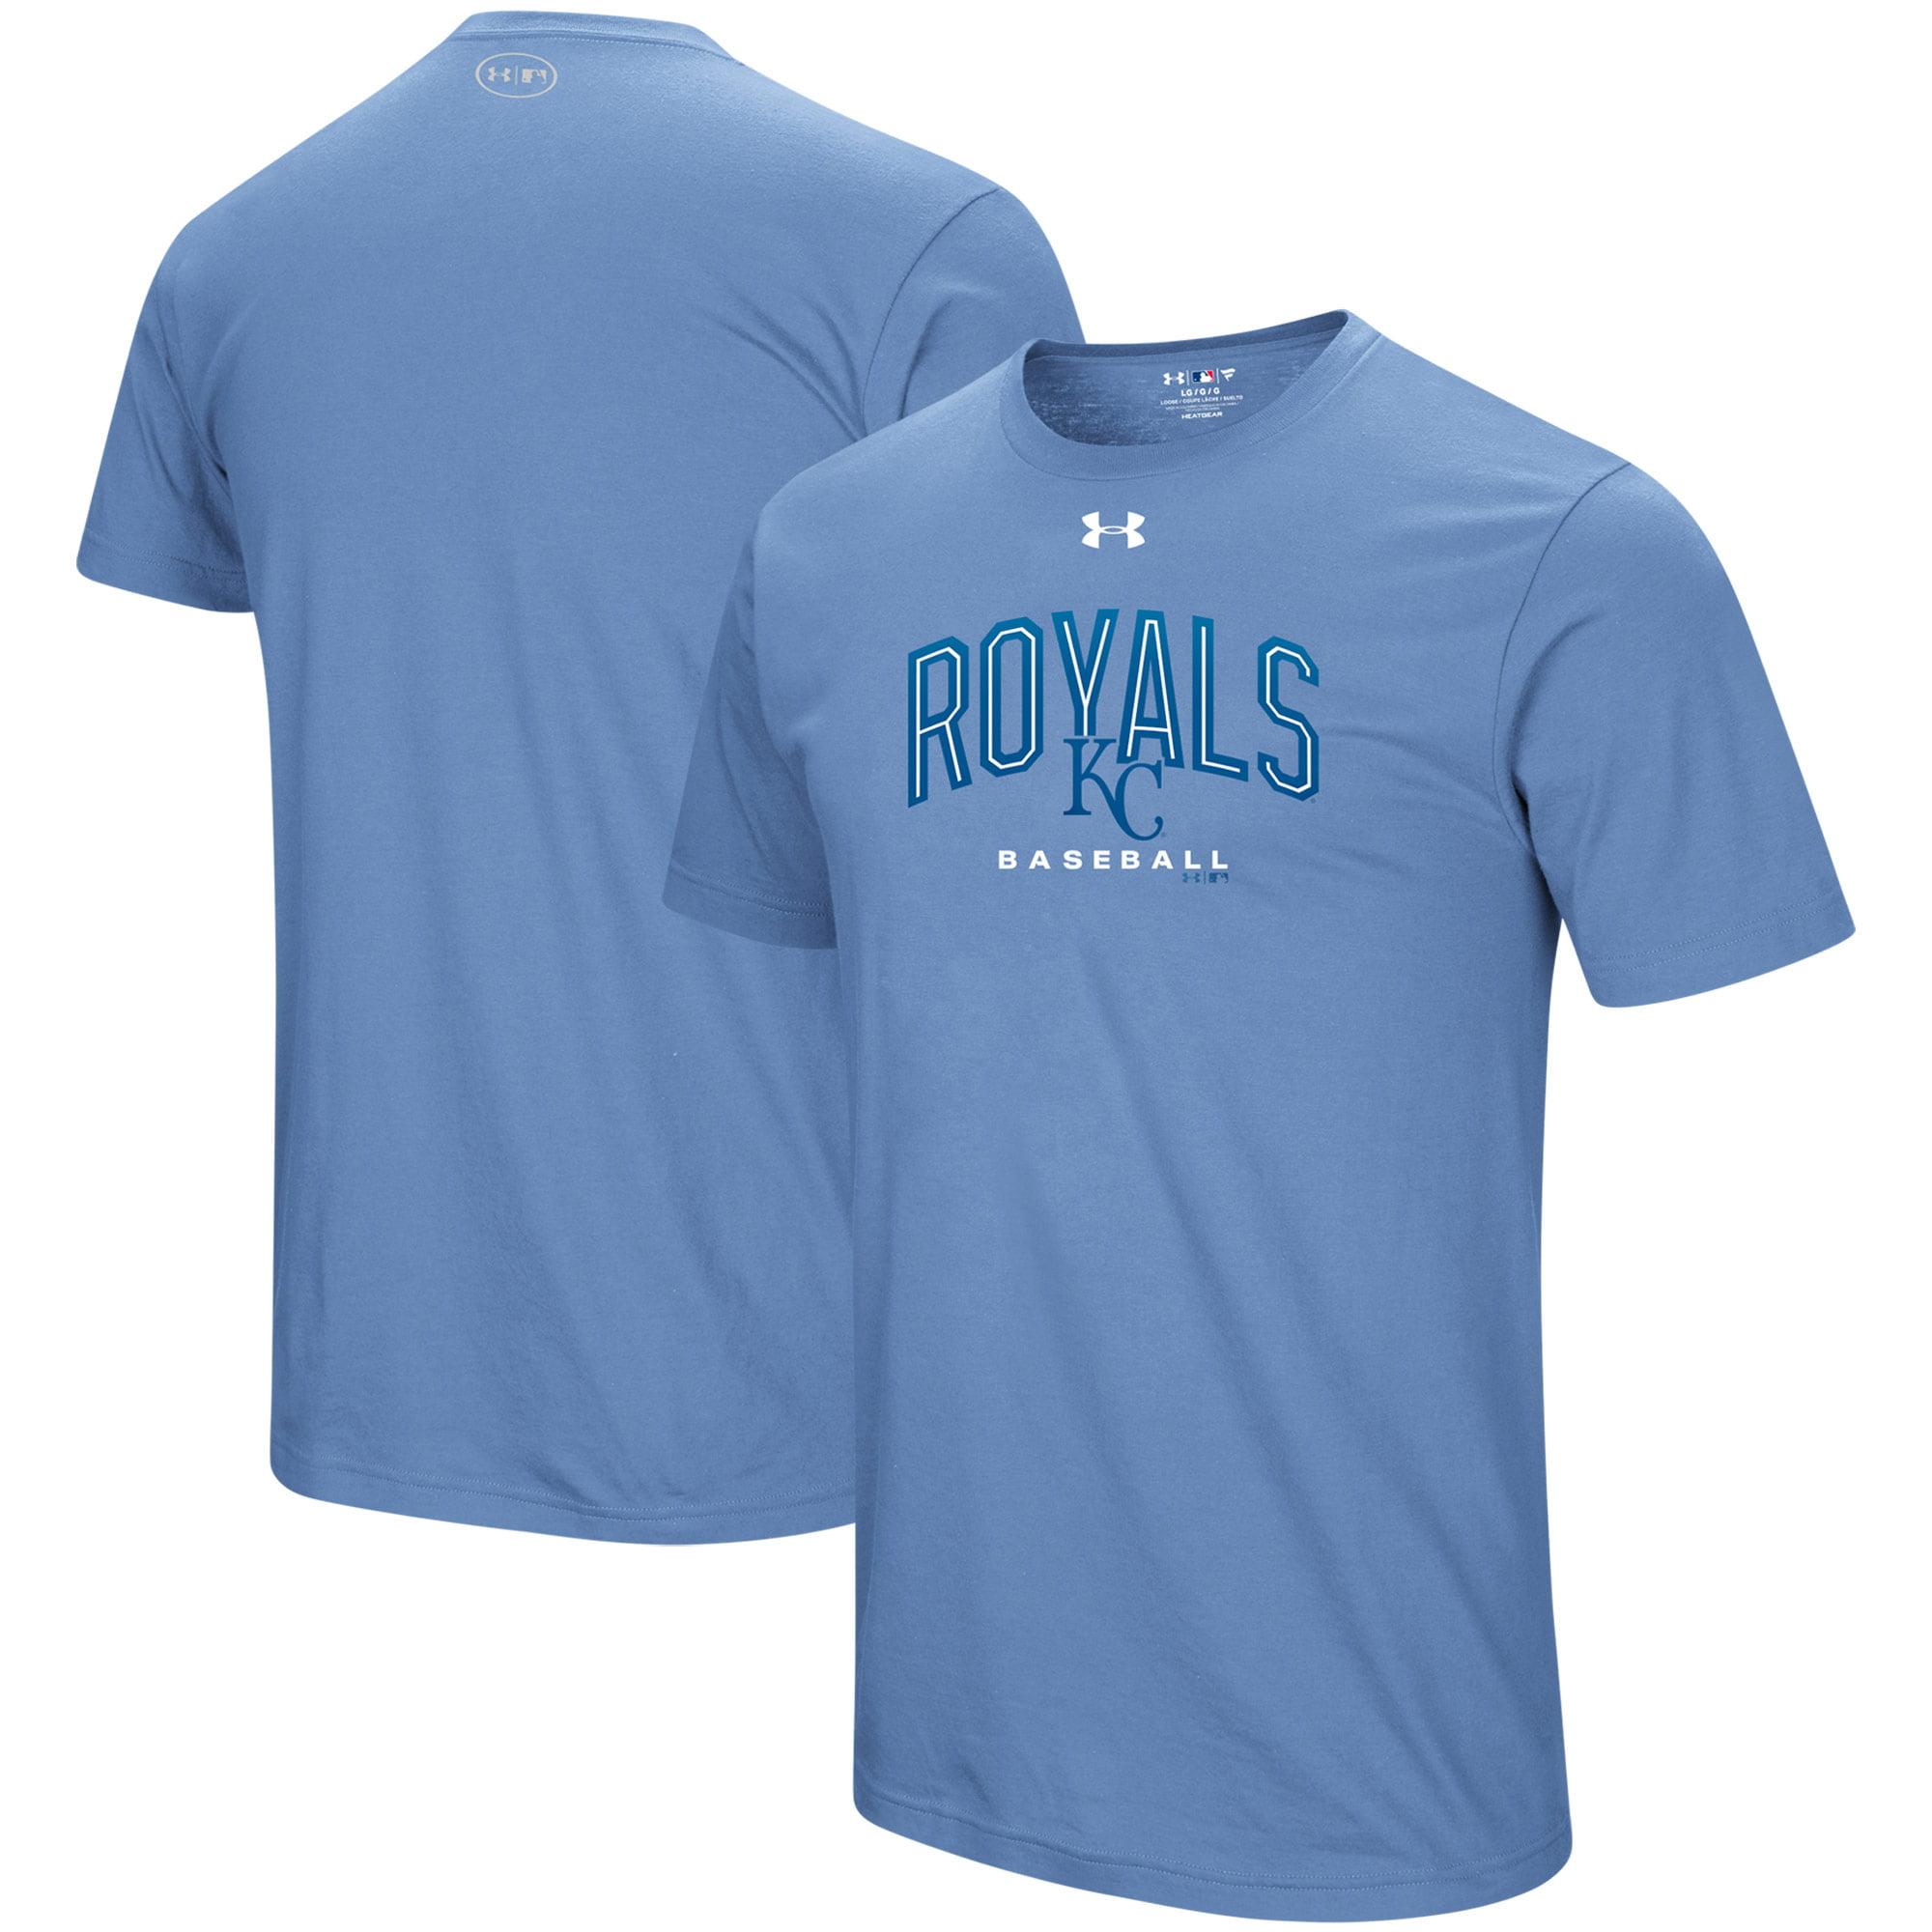 Kansas City Royals Under Armour Performance Arch T-Shirt - Light Blue